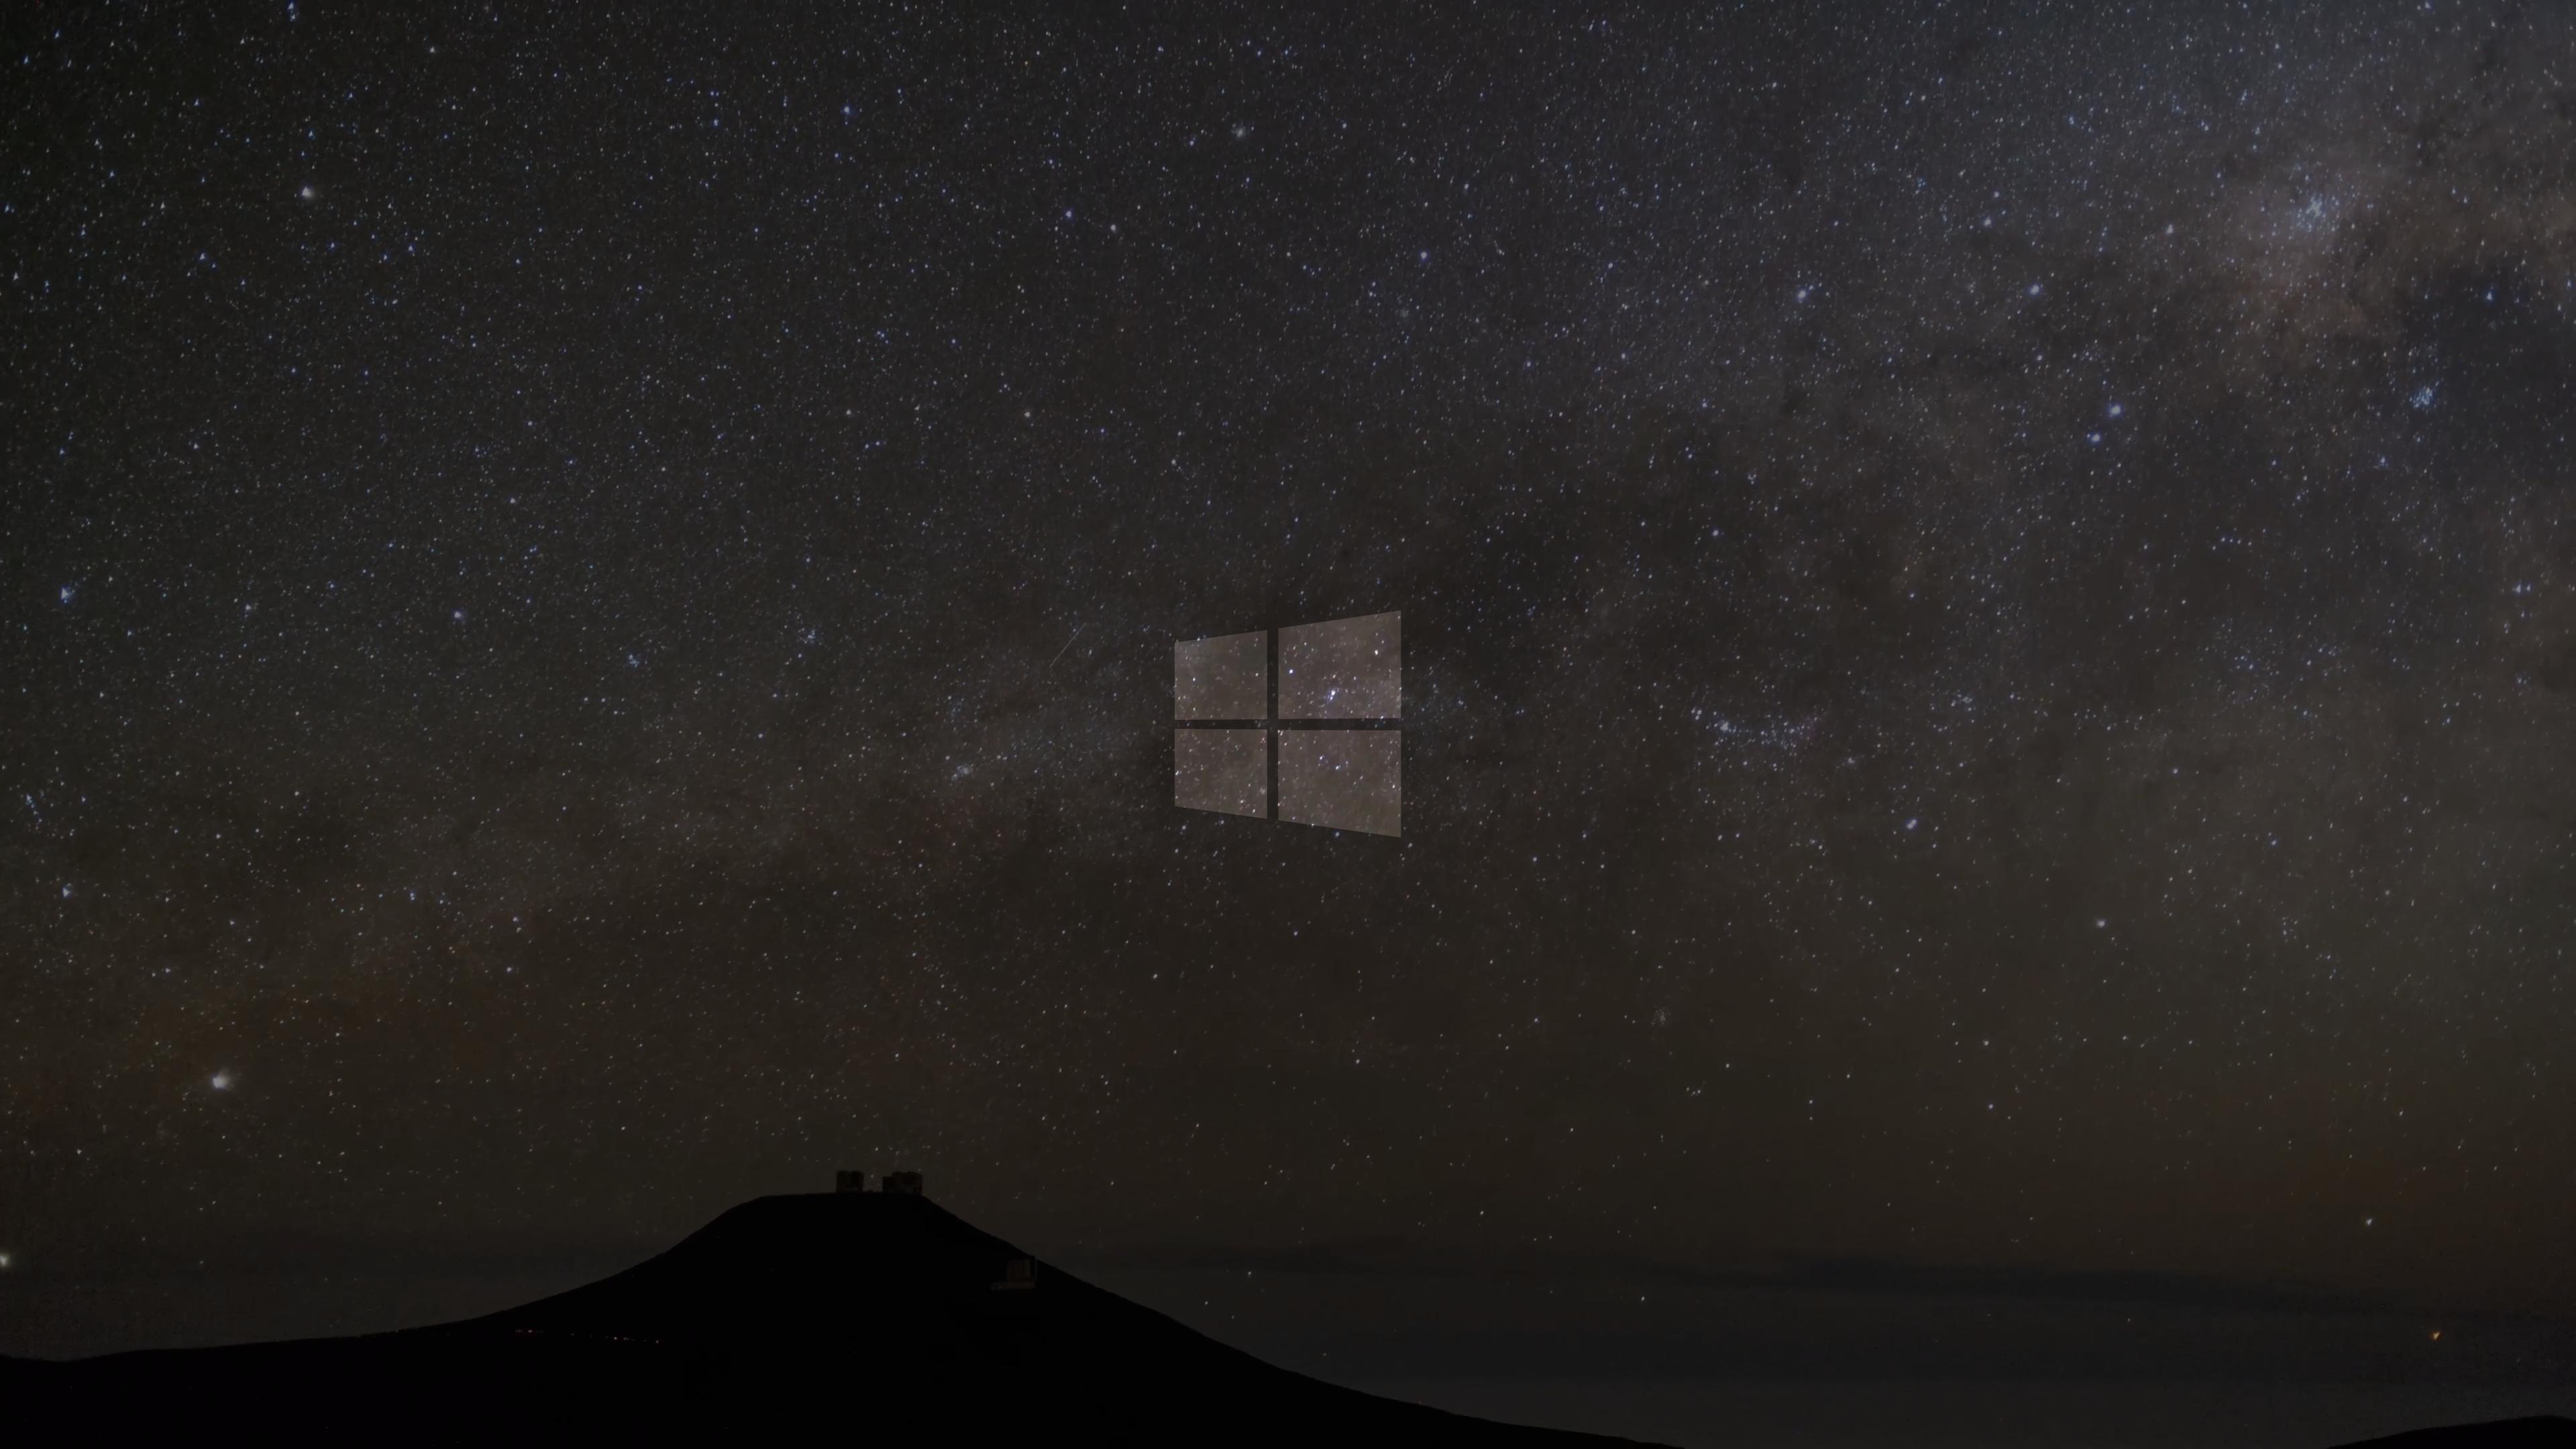 Windows 10 Black Wallpaper 67 Images